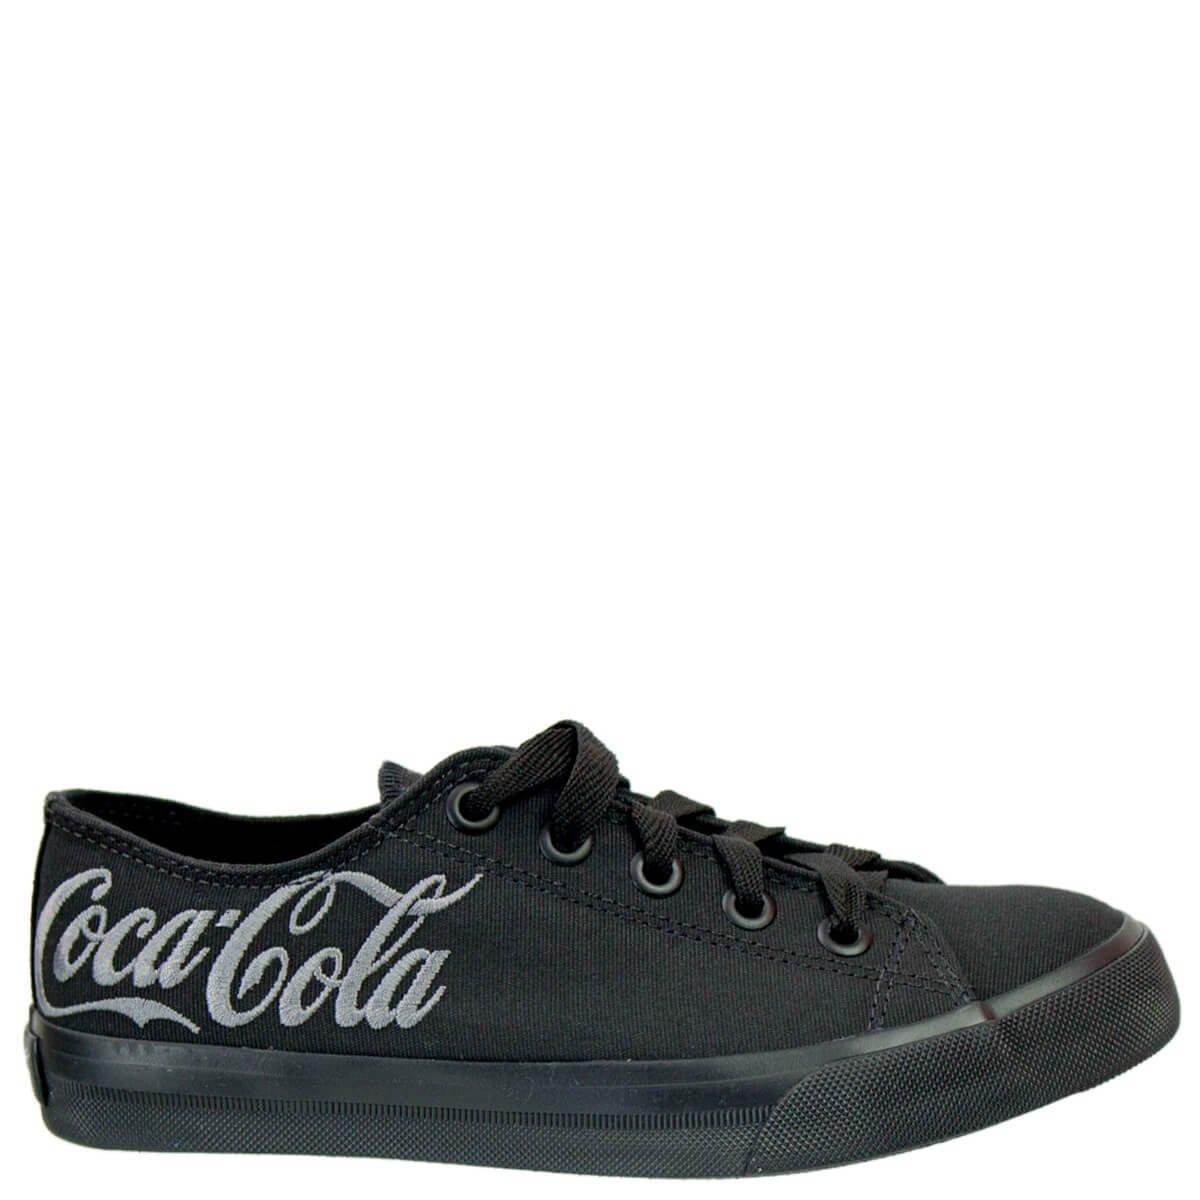 Bizz Store - Tênis Feminino Coca-Cola Basket b03d62fae01